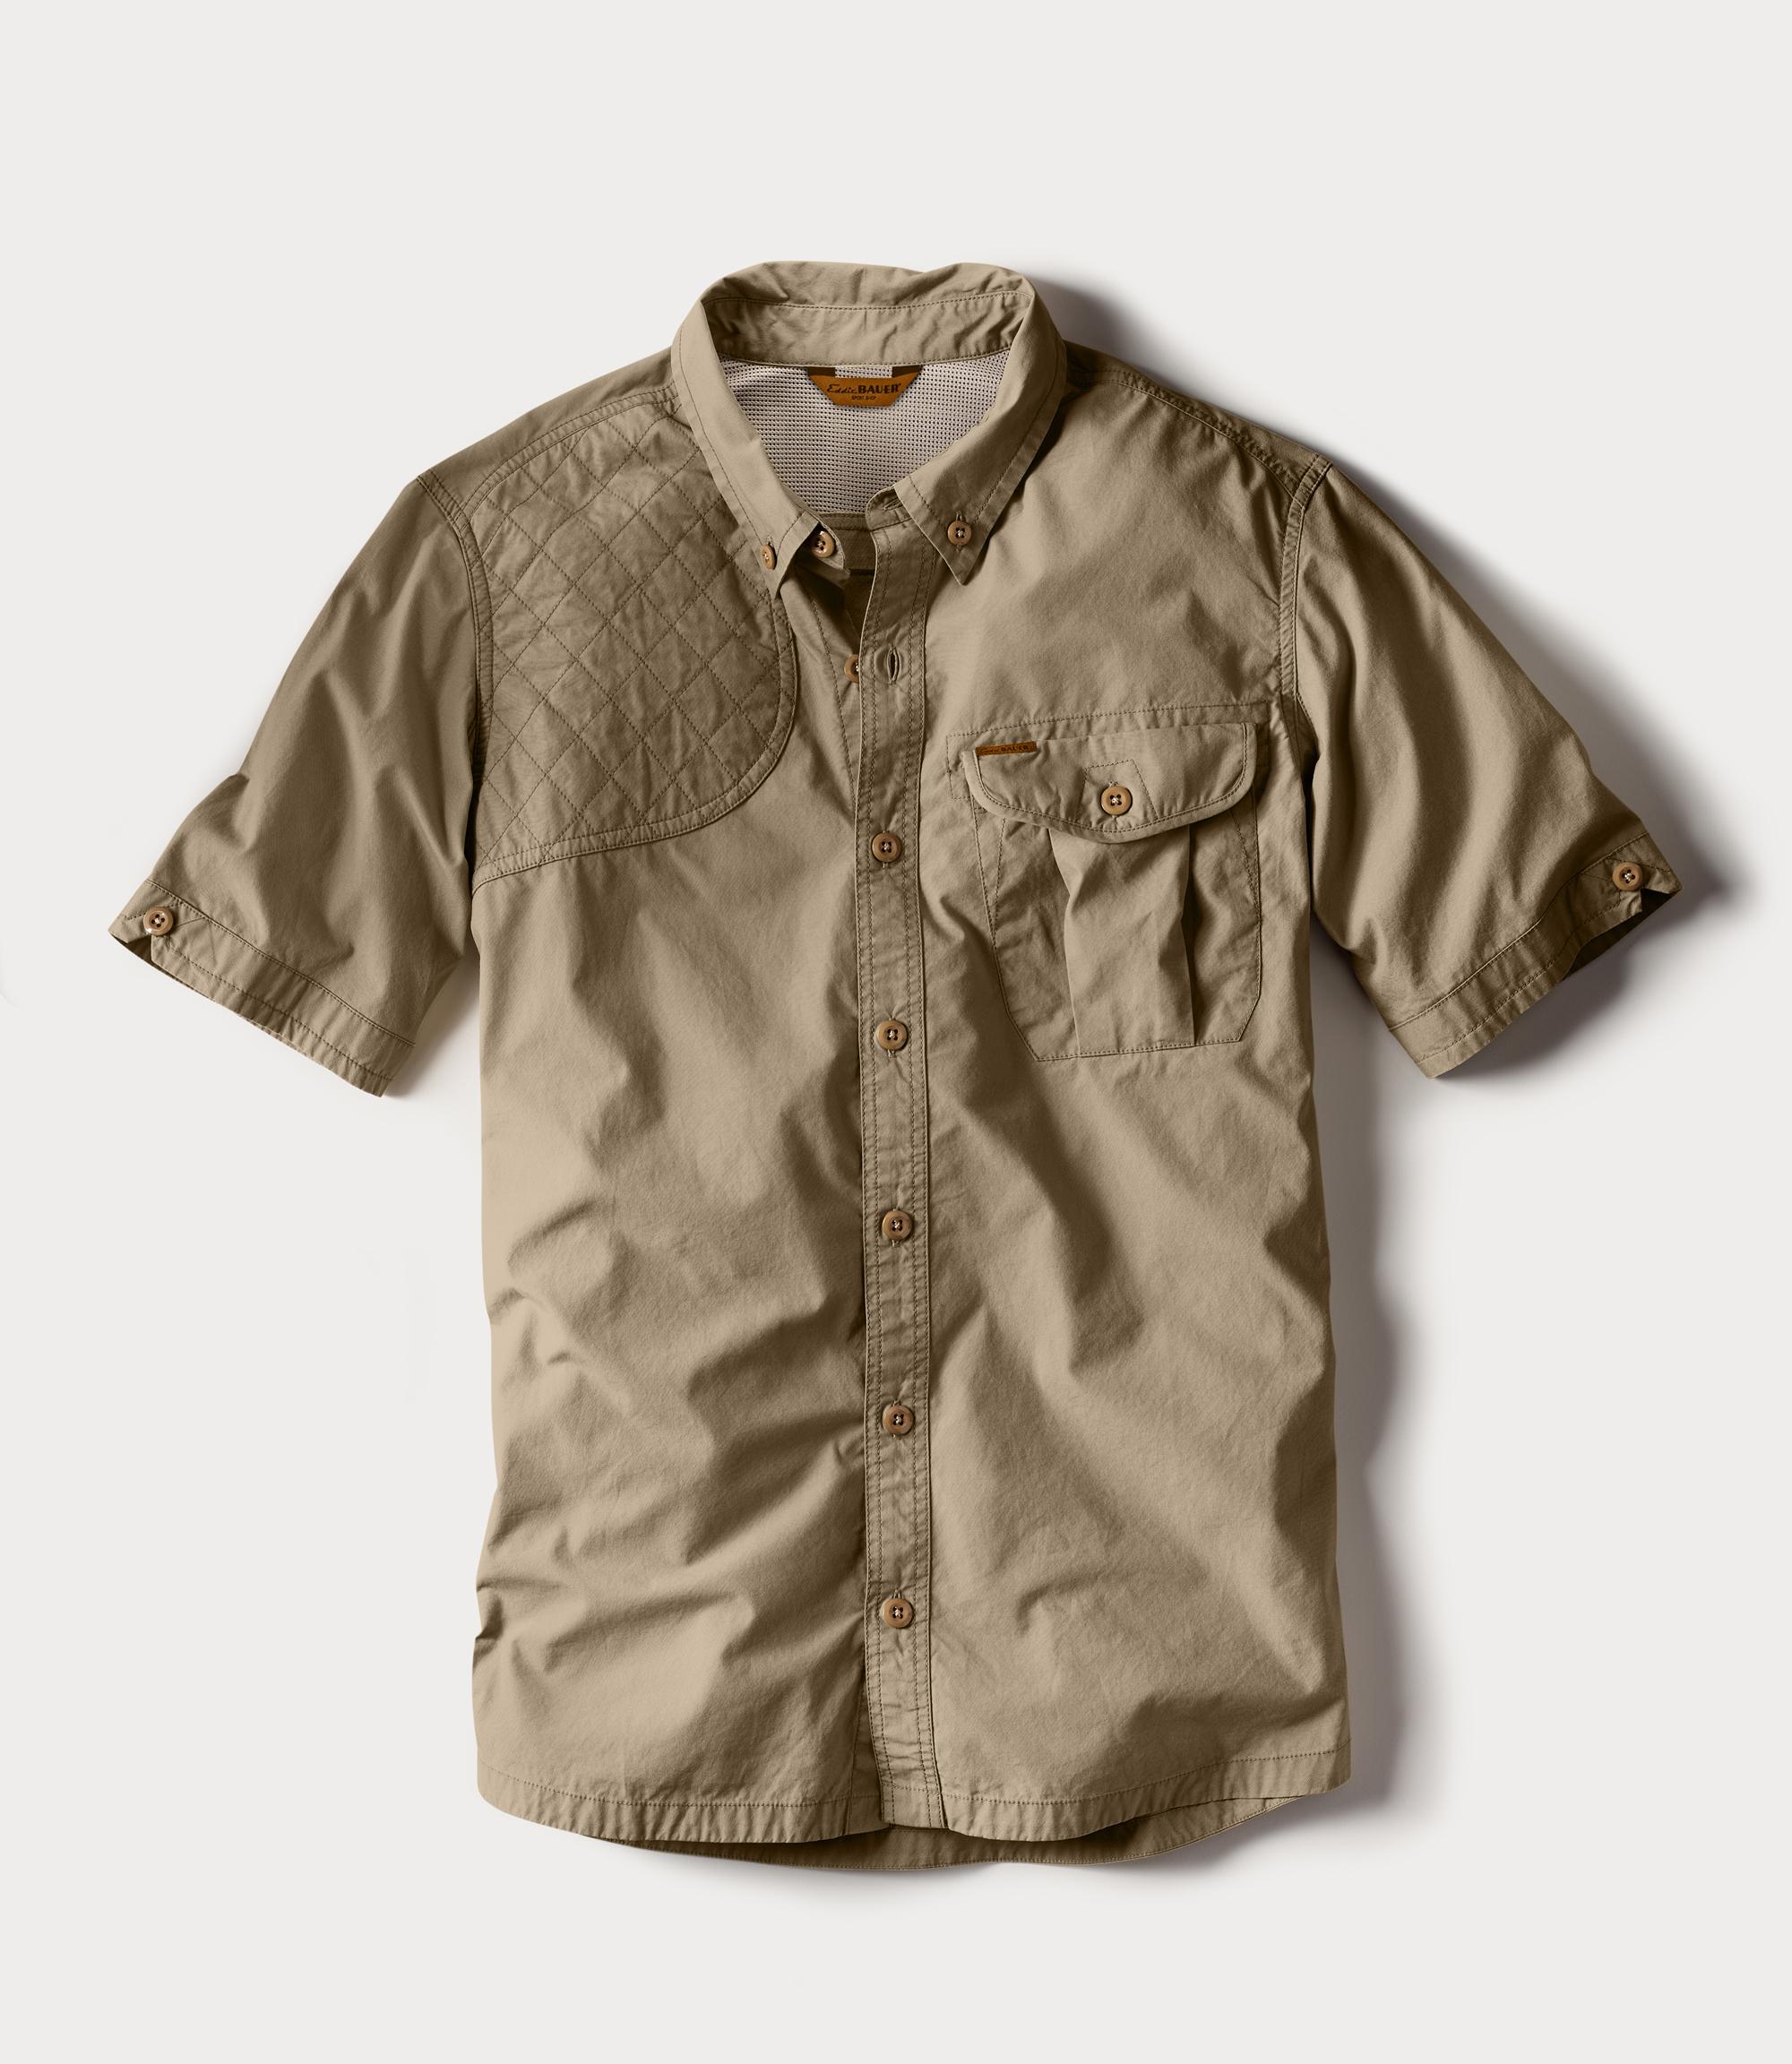 M's Palouse Short-Sleeve Shooting Shirt - Tan